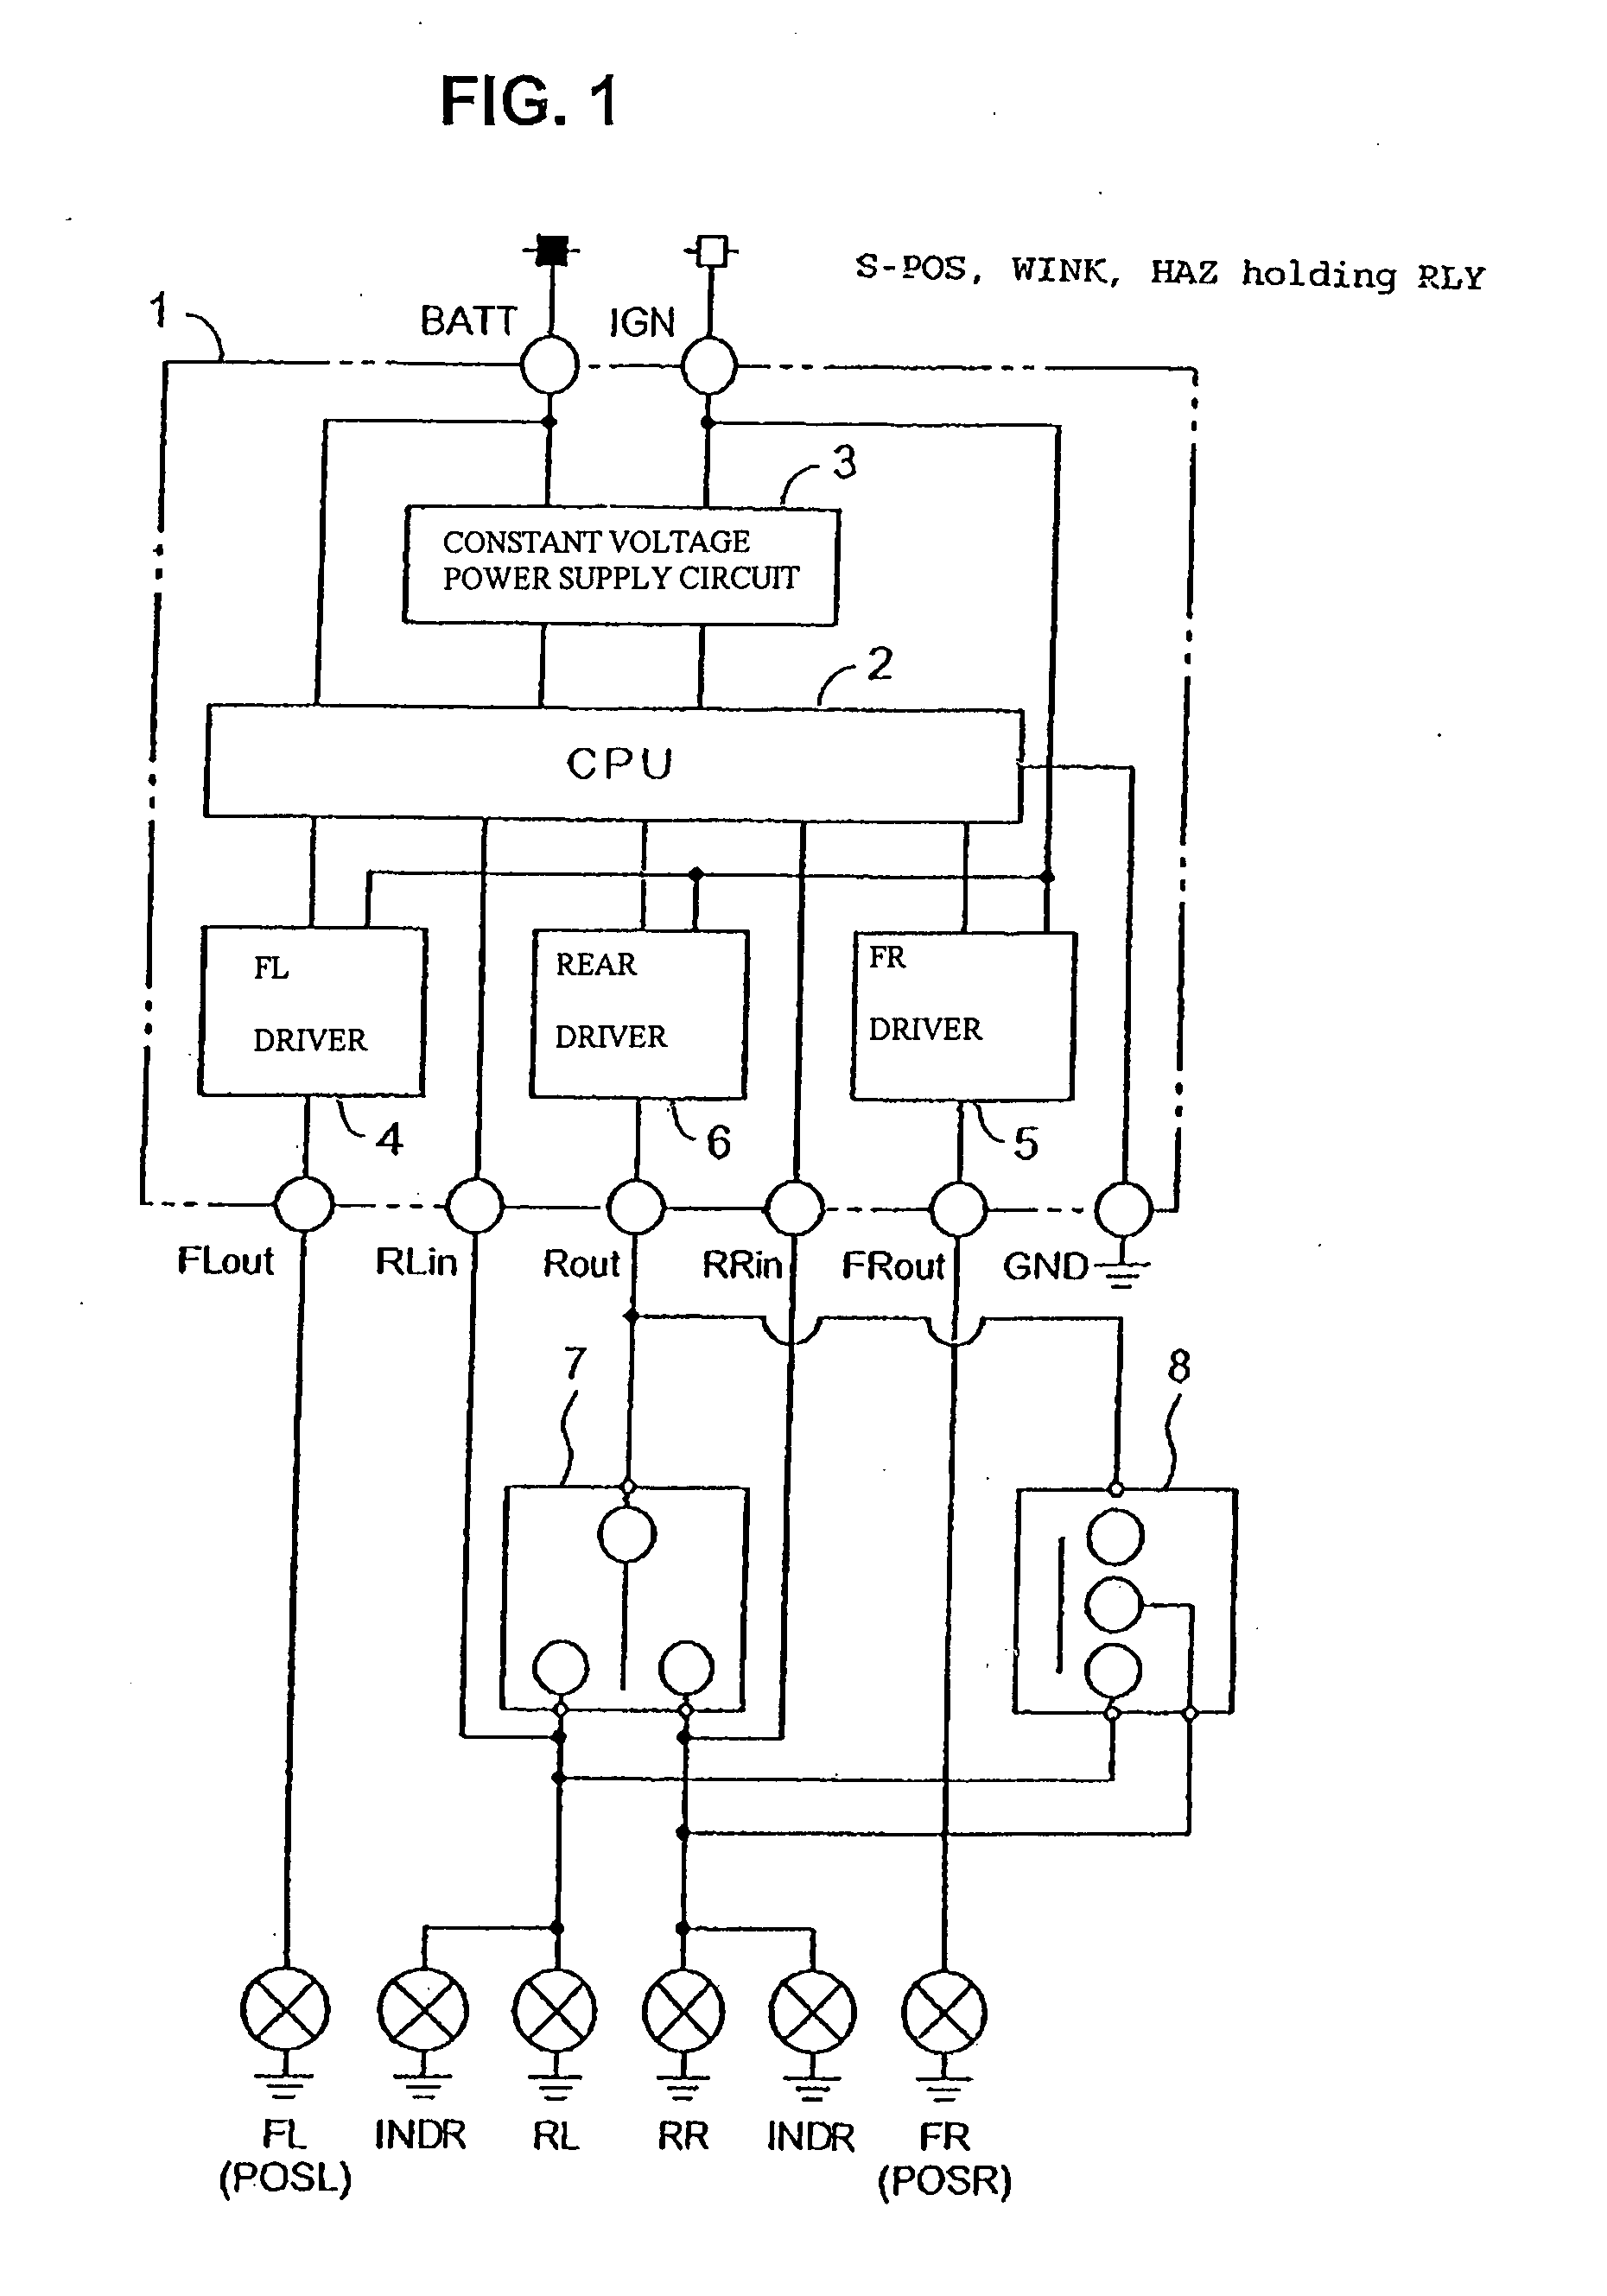 ... wiring diagram car alarm forums · reset autowatch immob anti hijack tolken ...